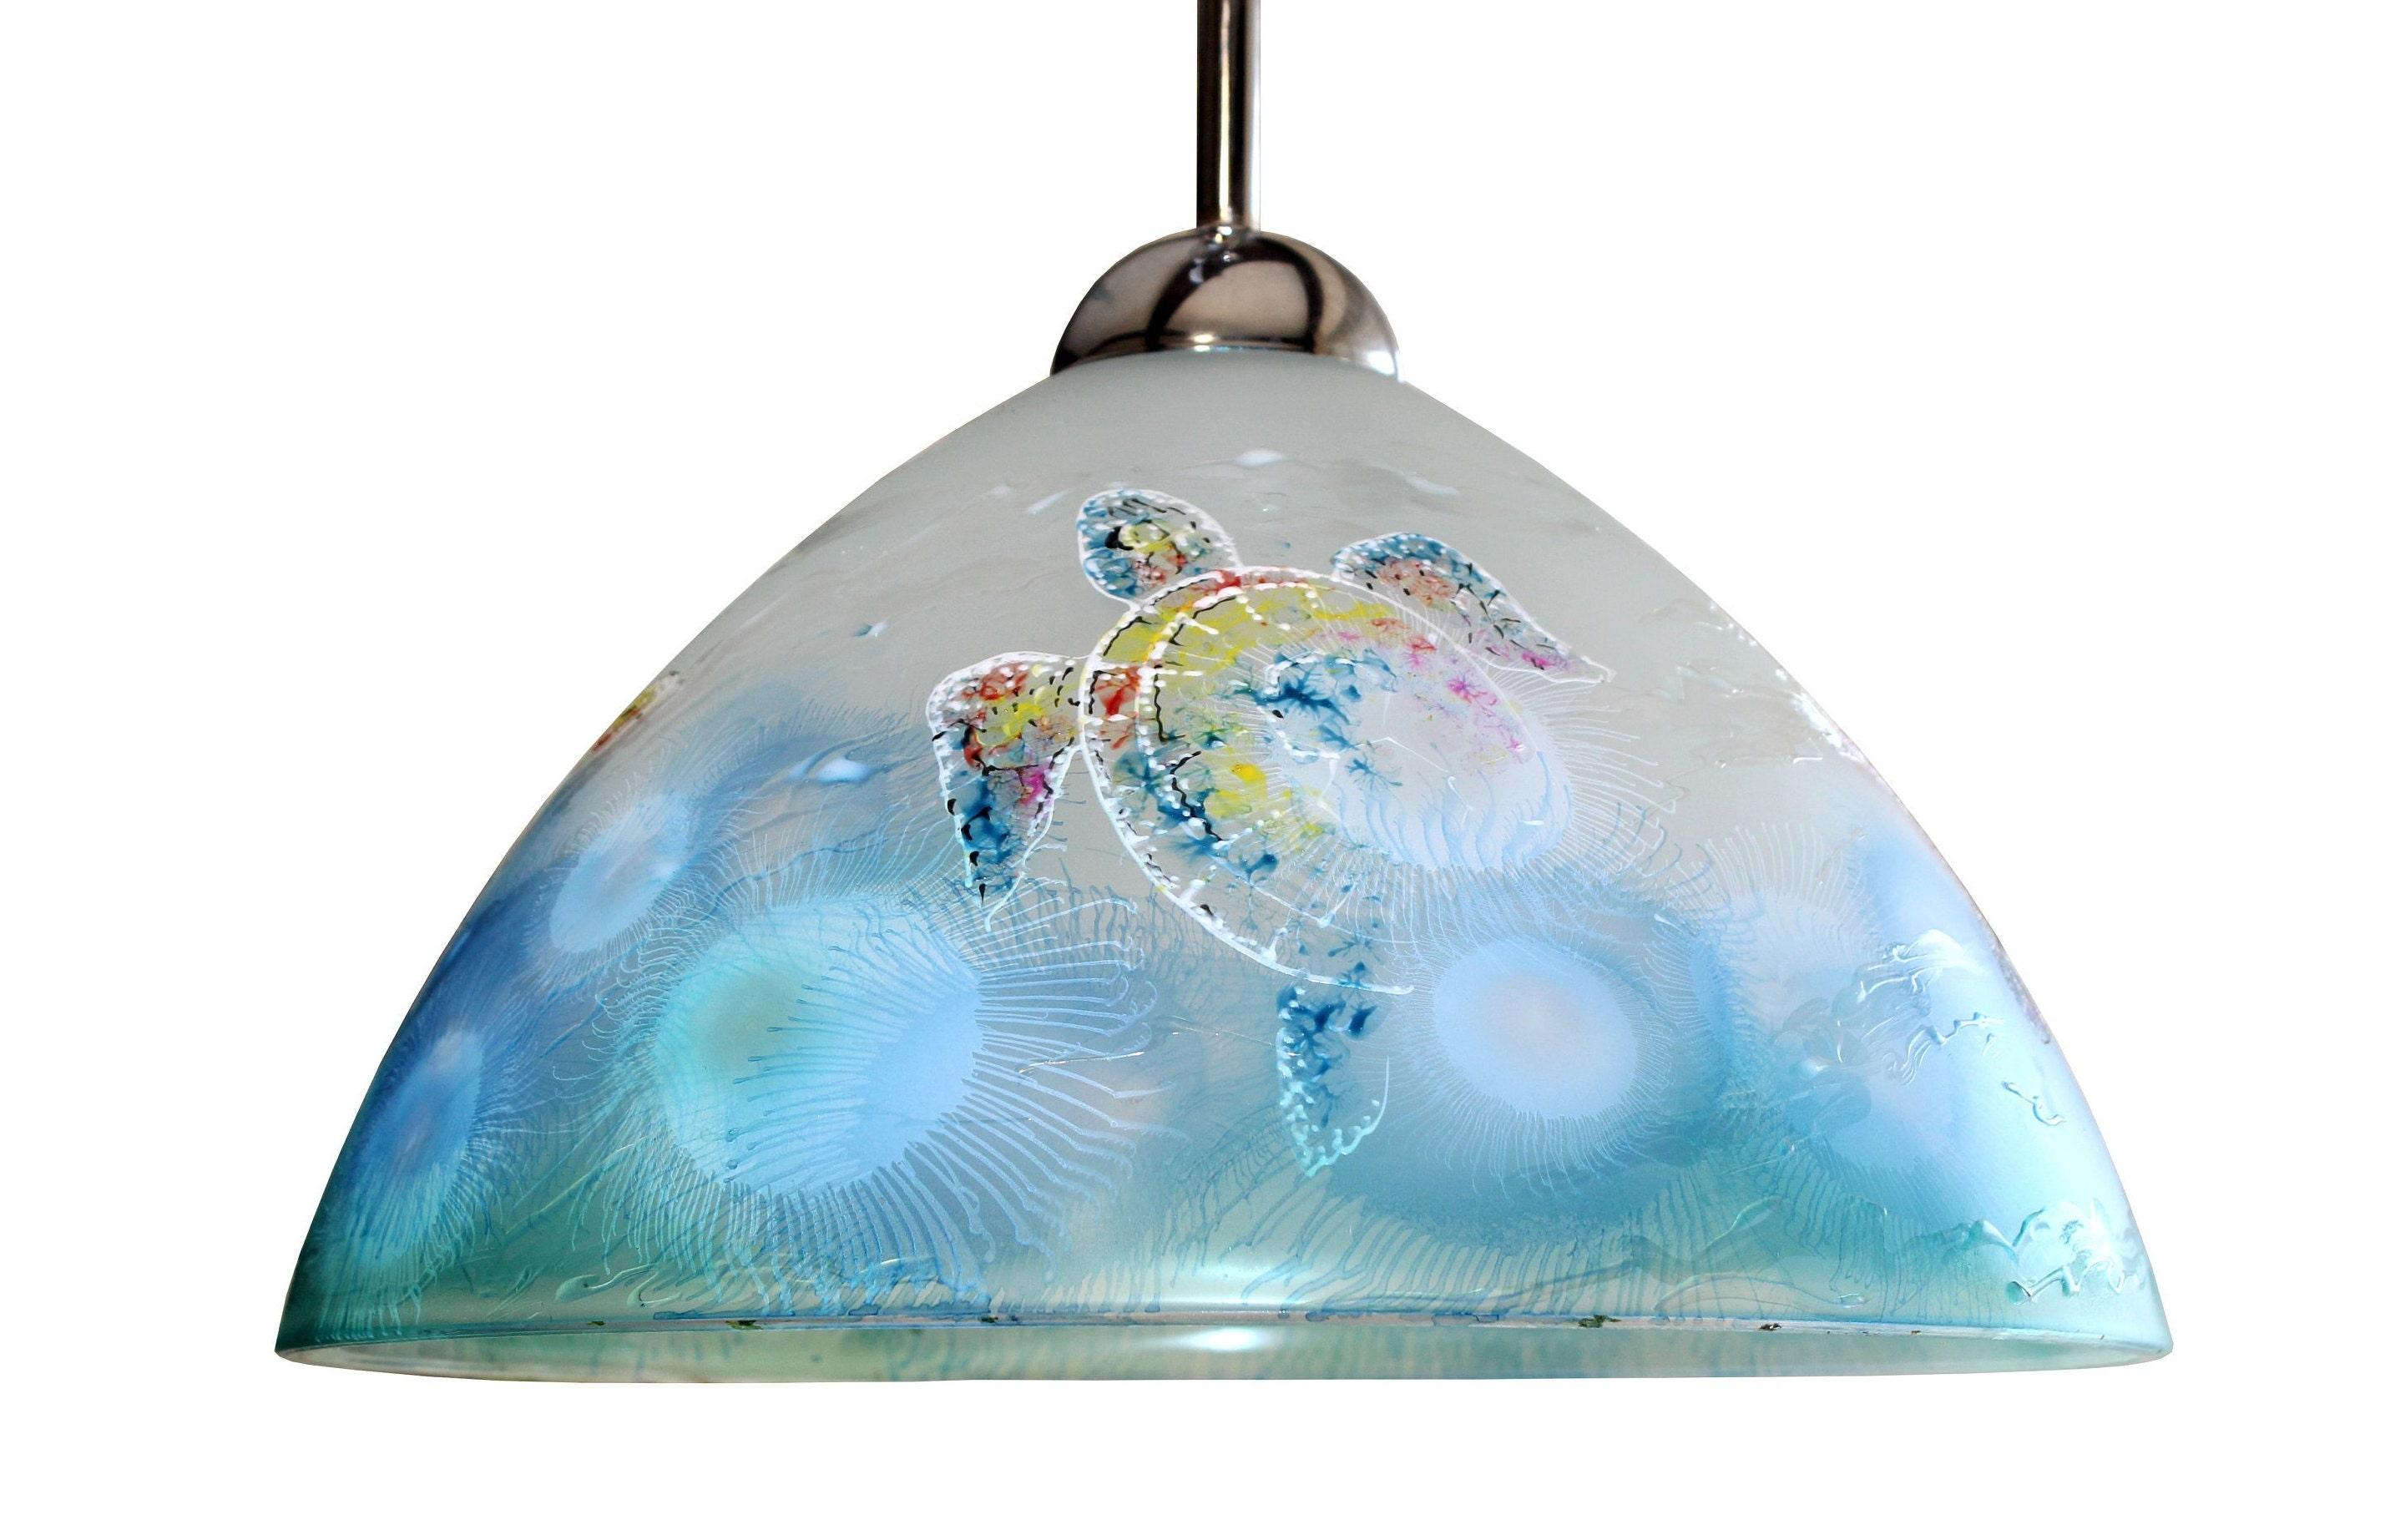 Nautical light chandelier lights coastal lighting sea beach ocean lamp ceiling fixture ceiling lampshade painted glass decor pendant lamp